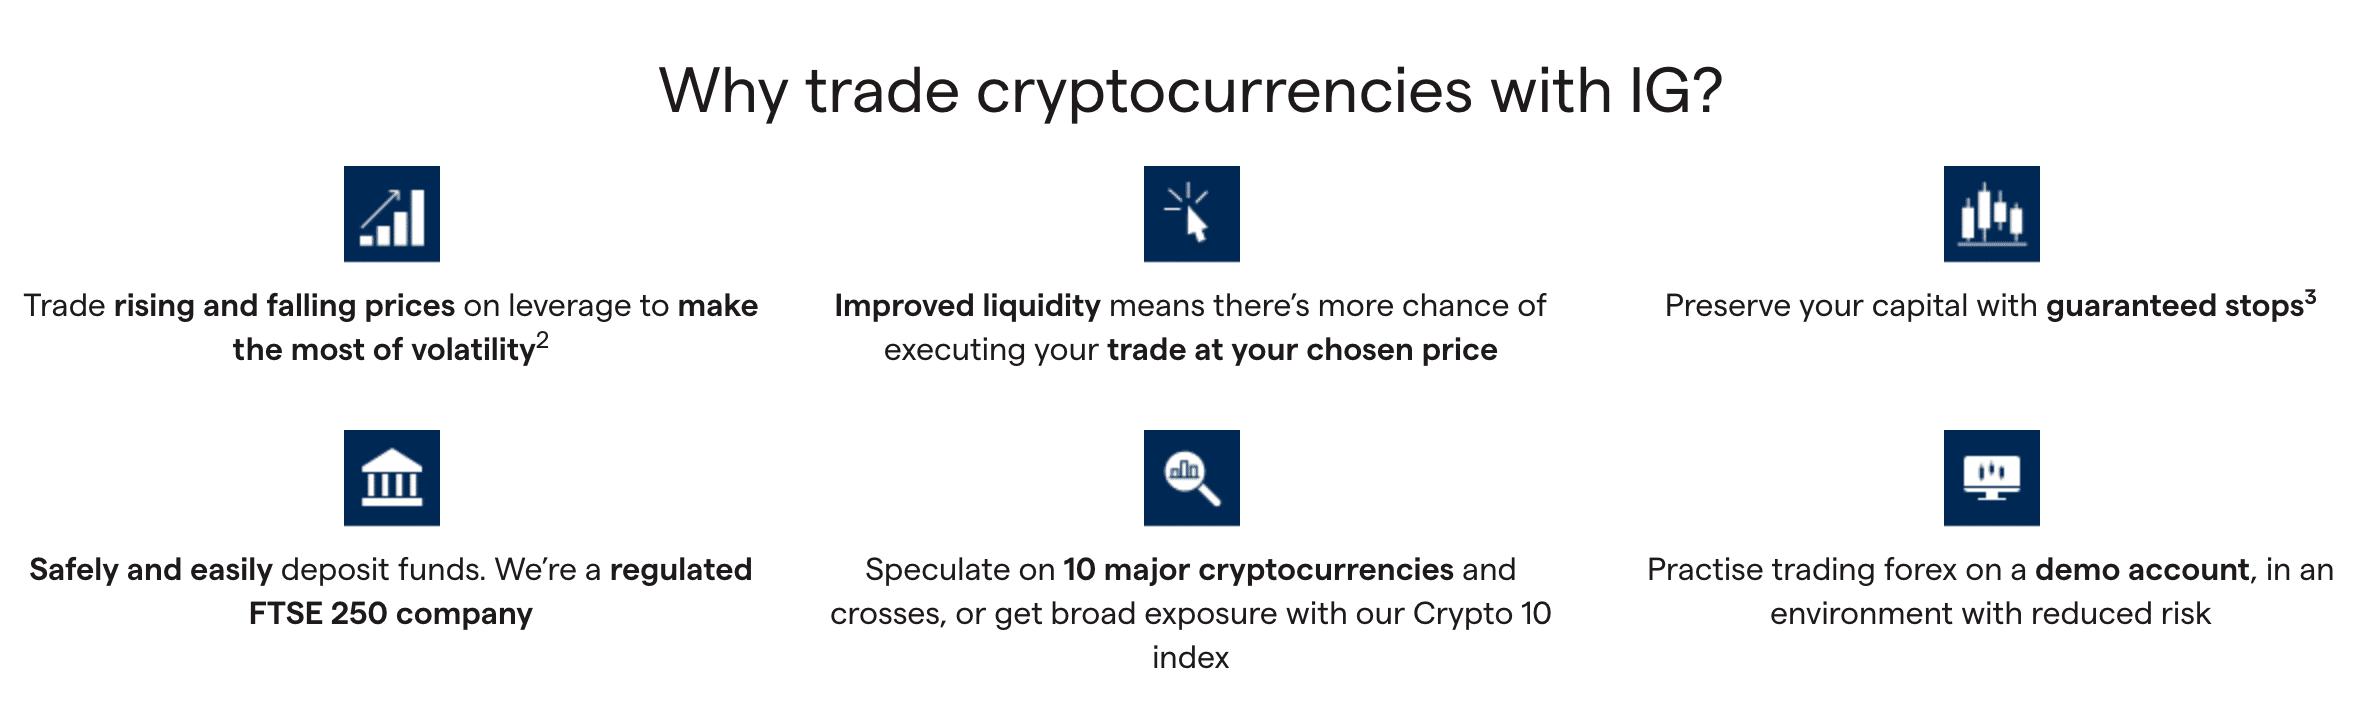 IG crypto trading